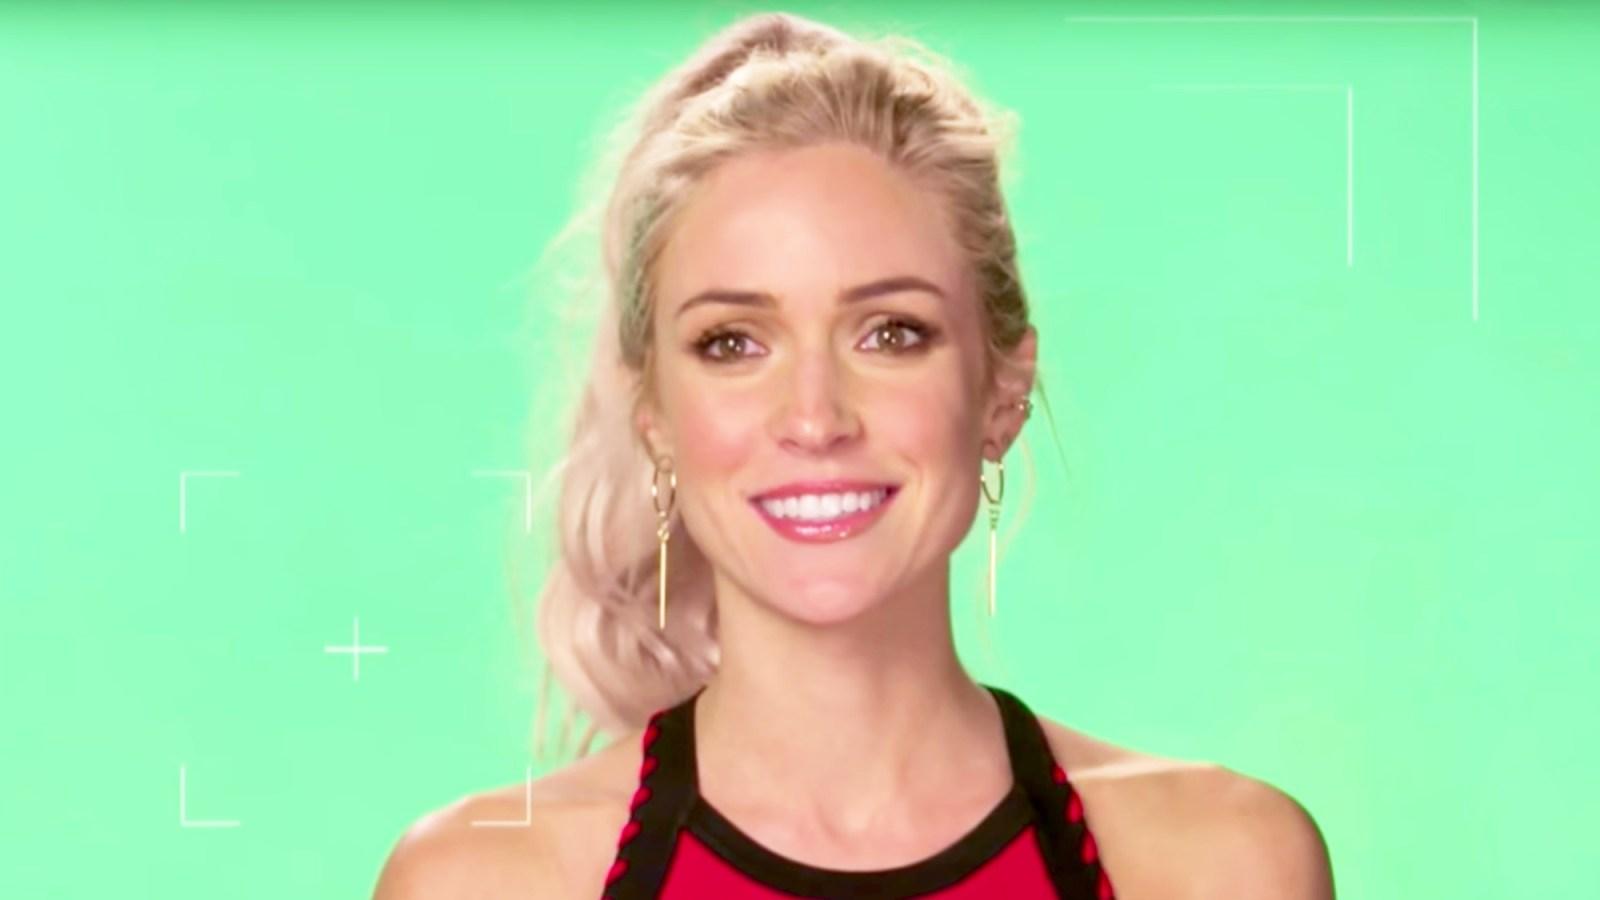 b435cd7f643bef Kristin Cavallari Shares Sneak Peek of New Reality Show 'Very Cavallari'  Featuring Jay Cutler